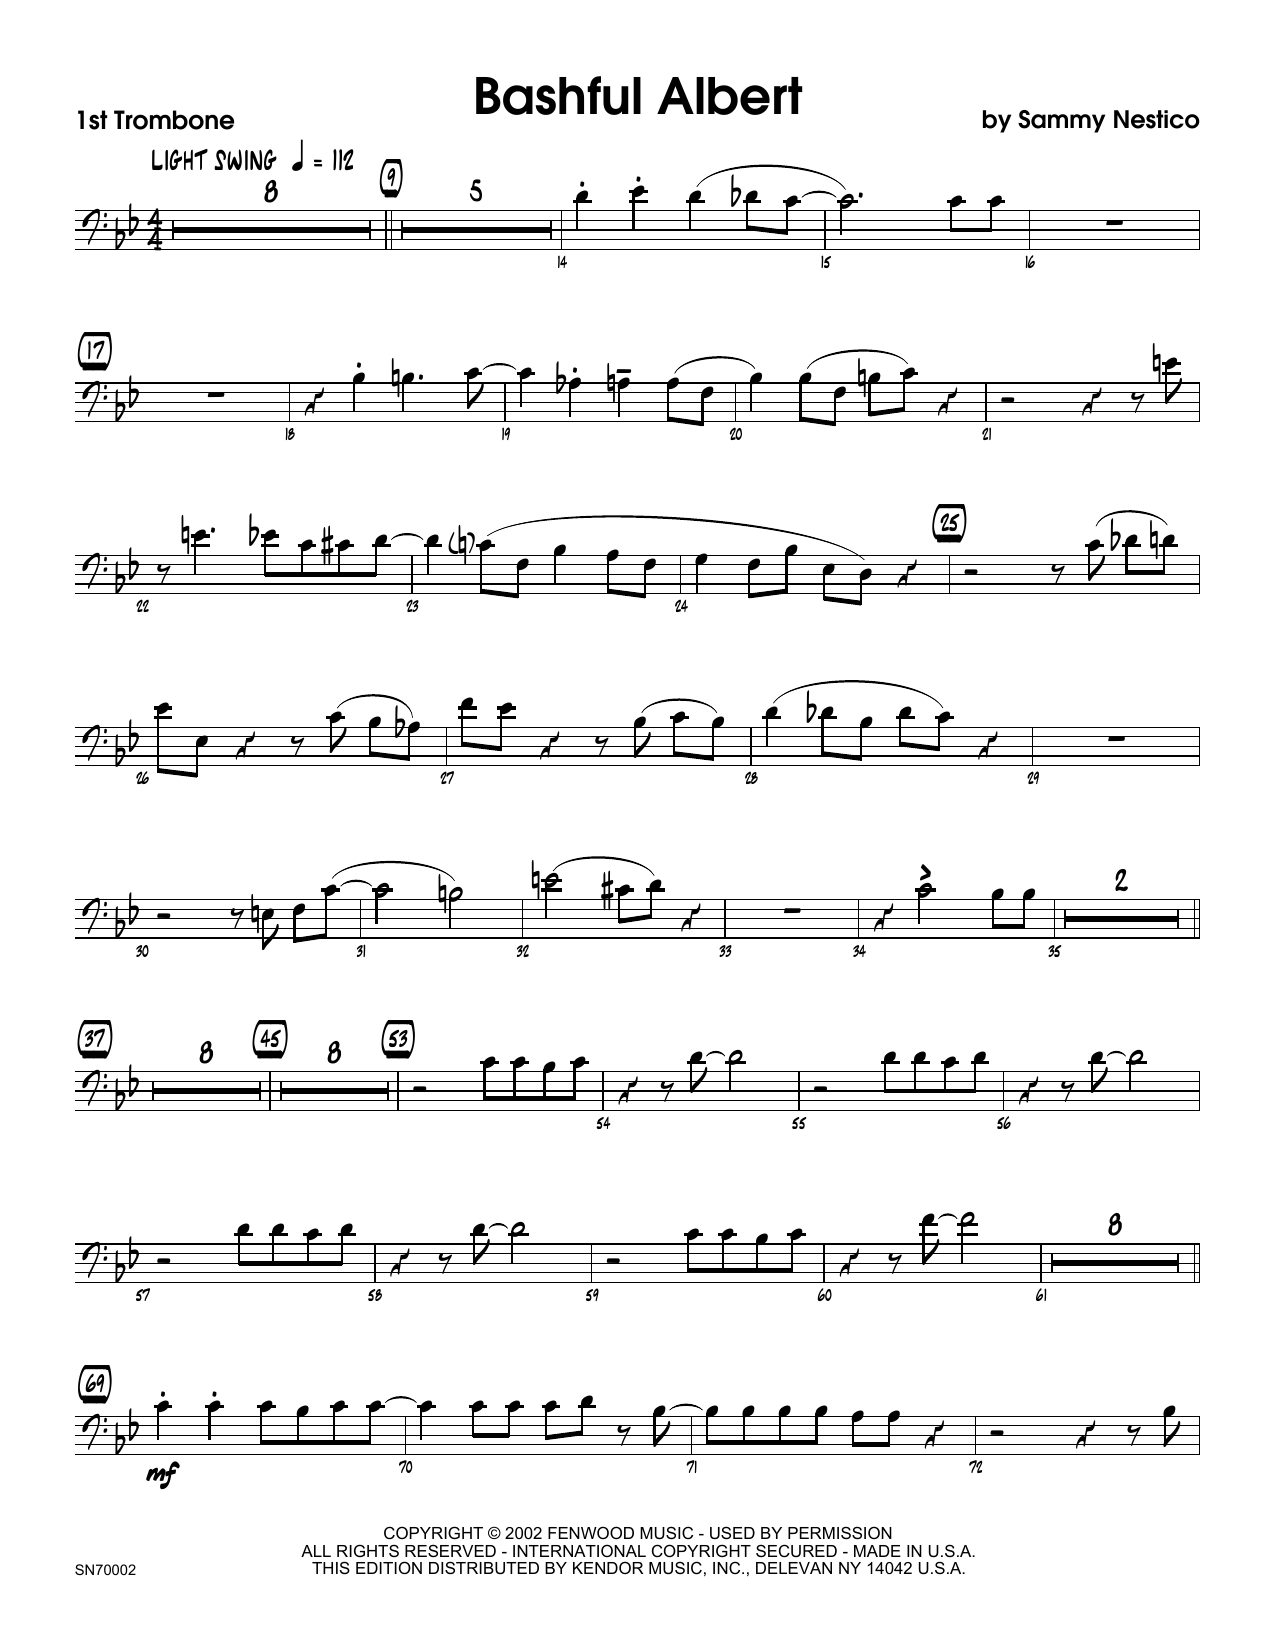 Bashful Albert - 1st Trombone Sheet Music